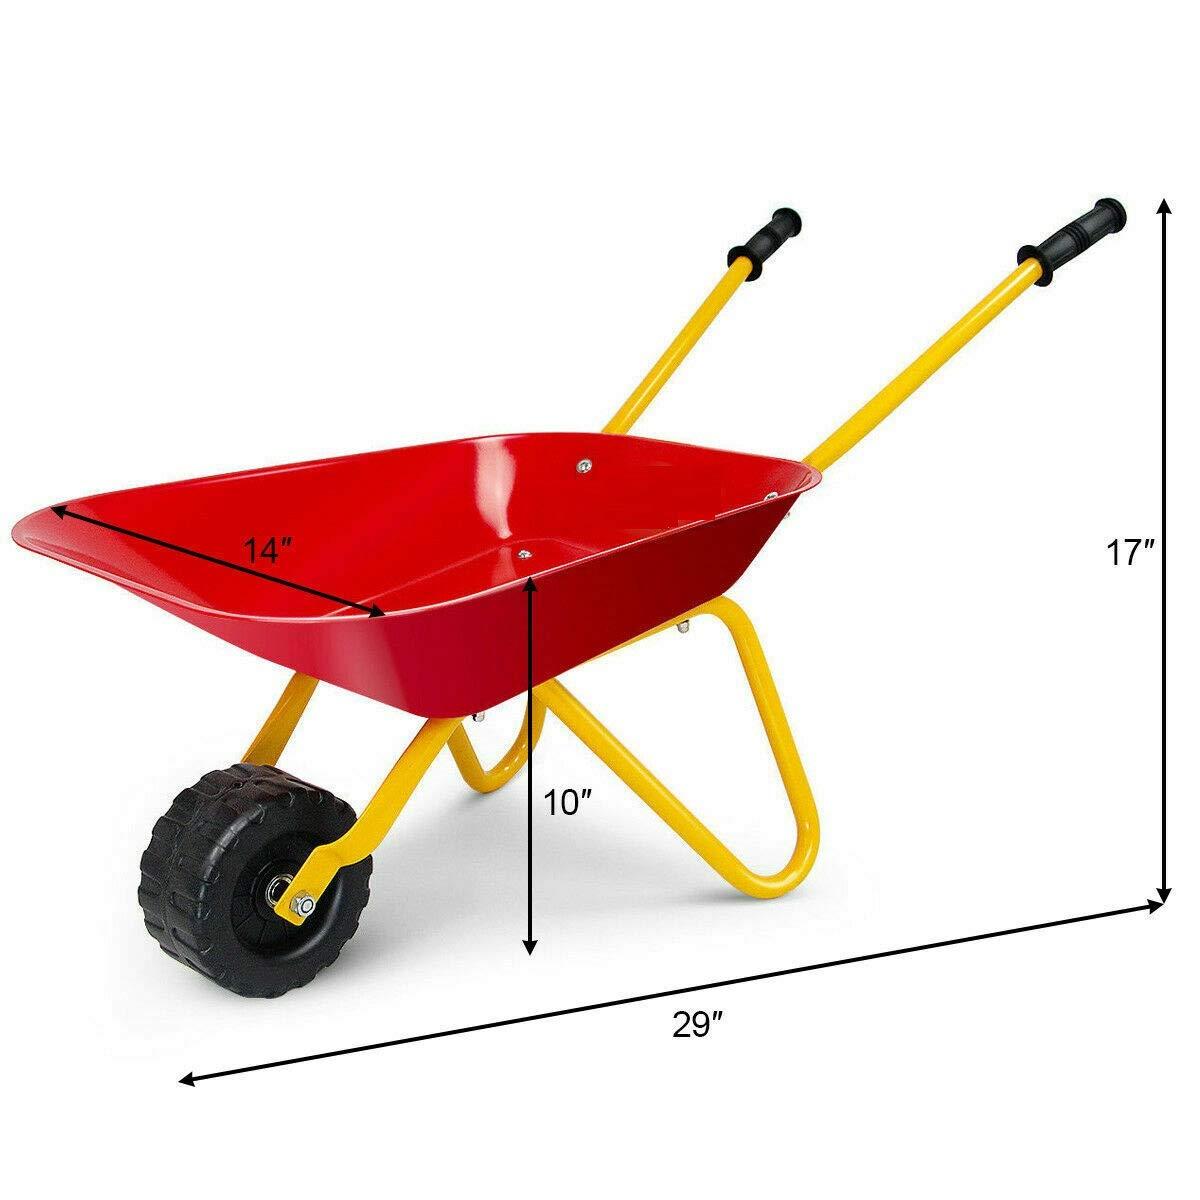 Heize best price Red Kids Metal Wheelbarrow Children's Size Outdoor Garden Backyard Play Toy by Heize best price (Image #4)